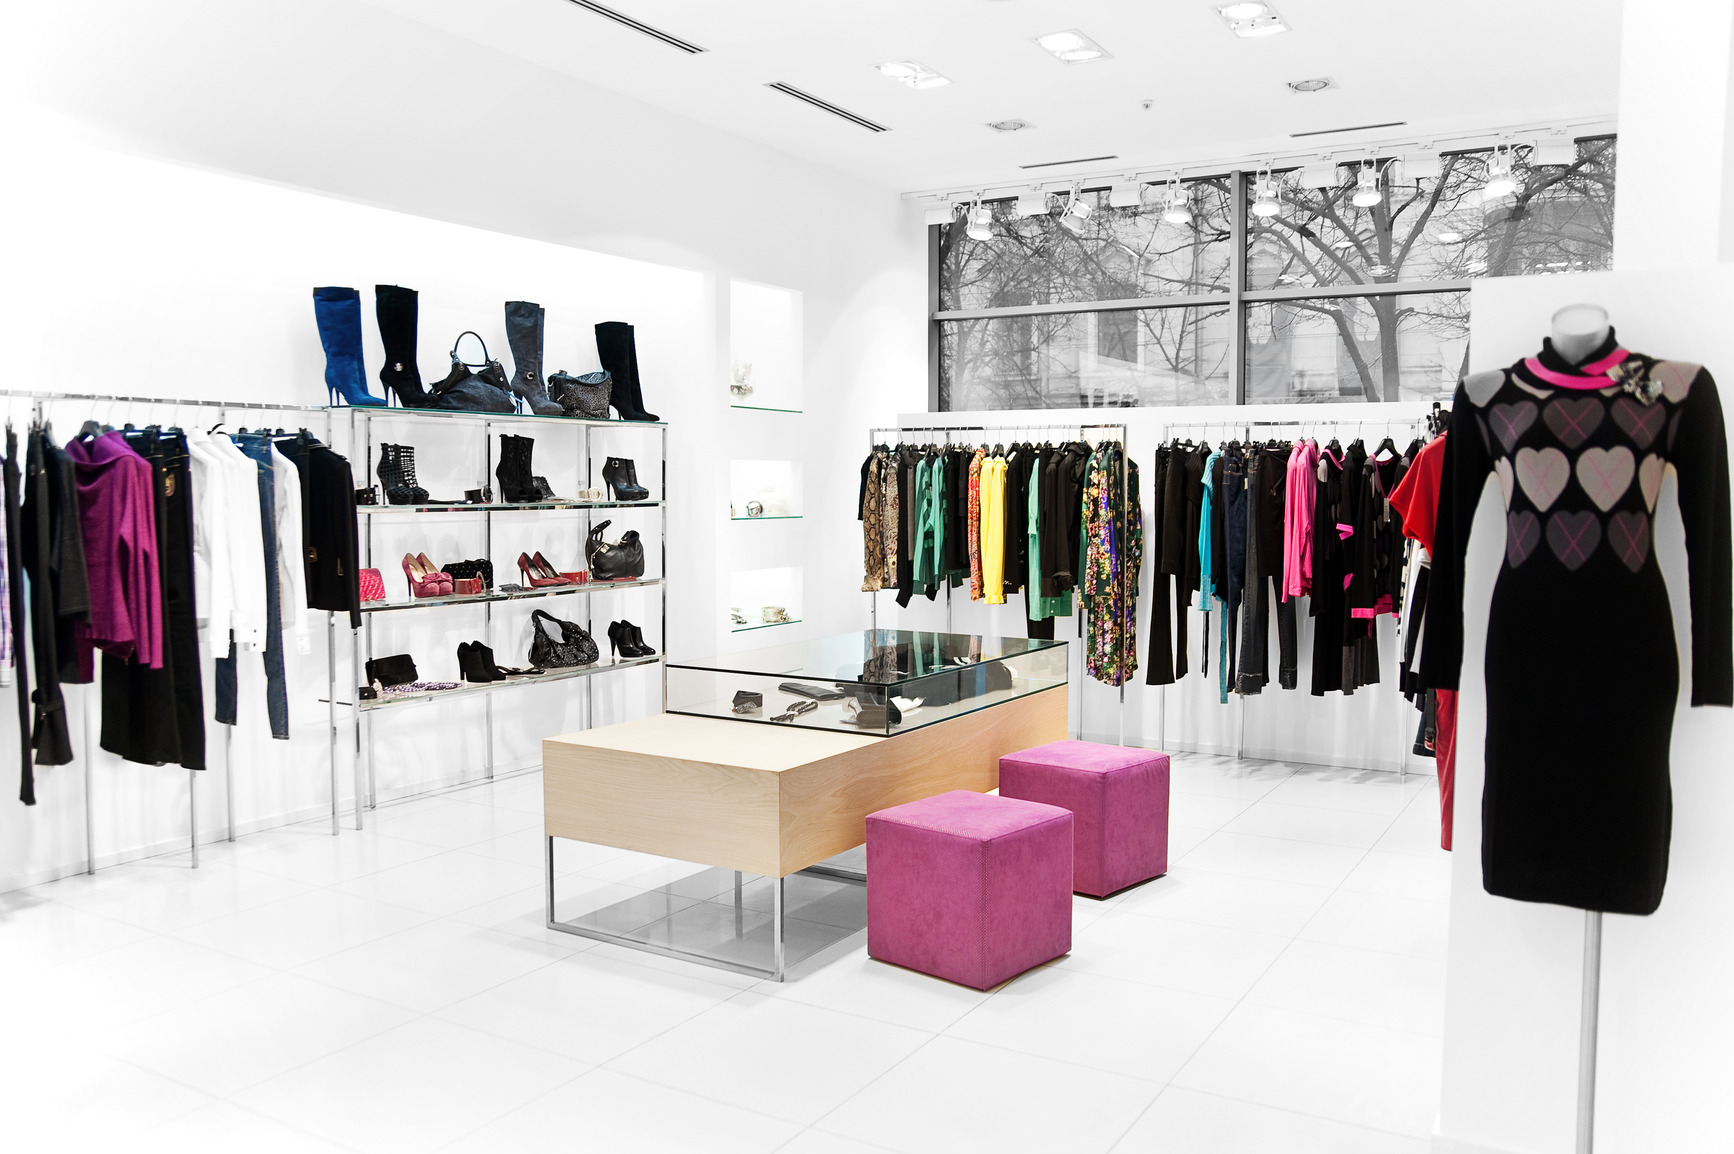 photodune 3025347 shop m - Online shopping is getting easier